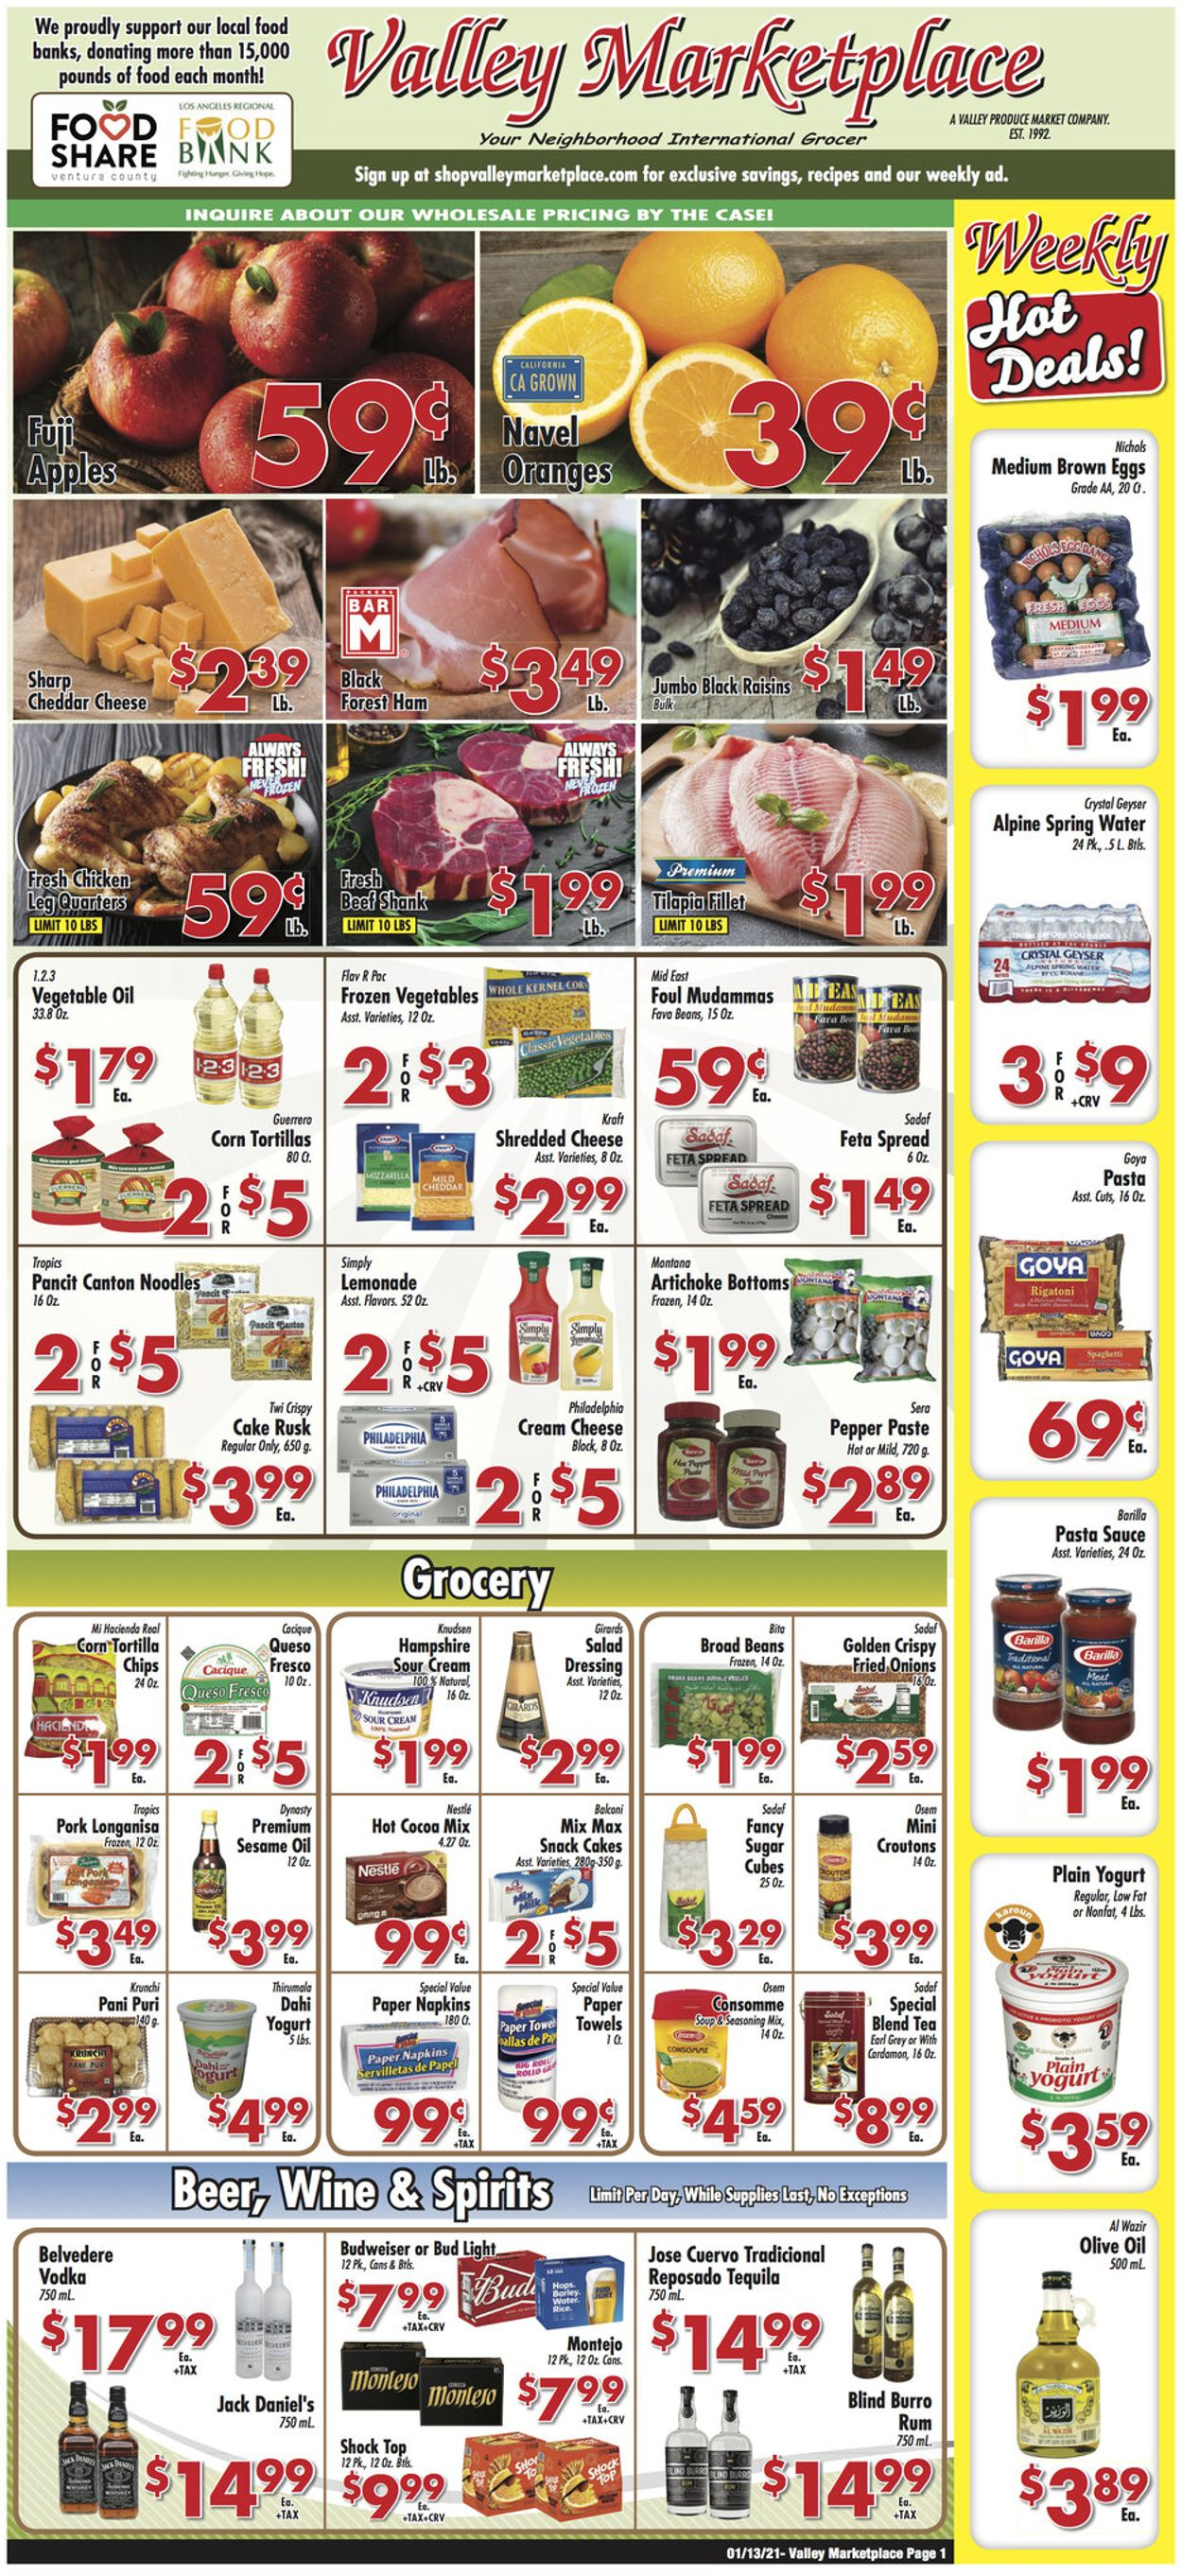 Valley Marketplace Weekly Ad Circular - valid 01/13-01/19/2021